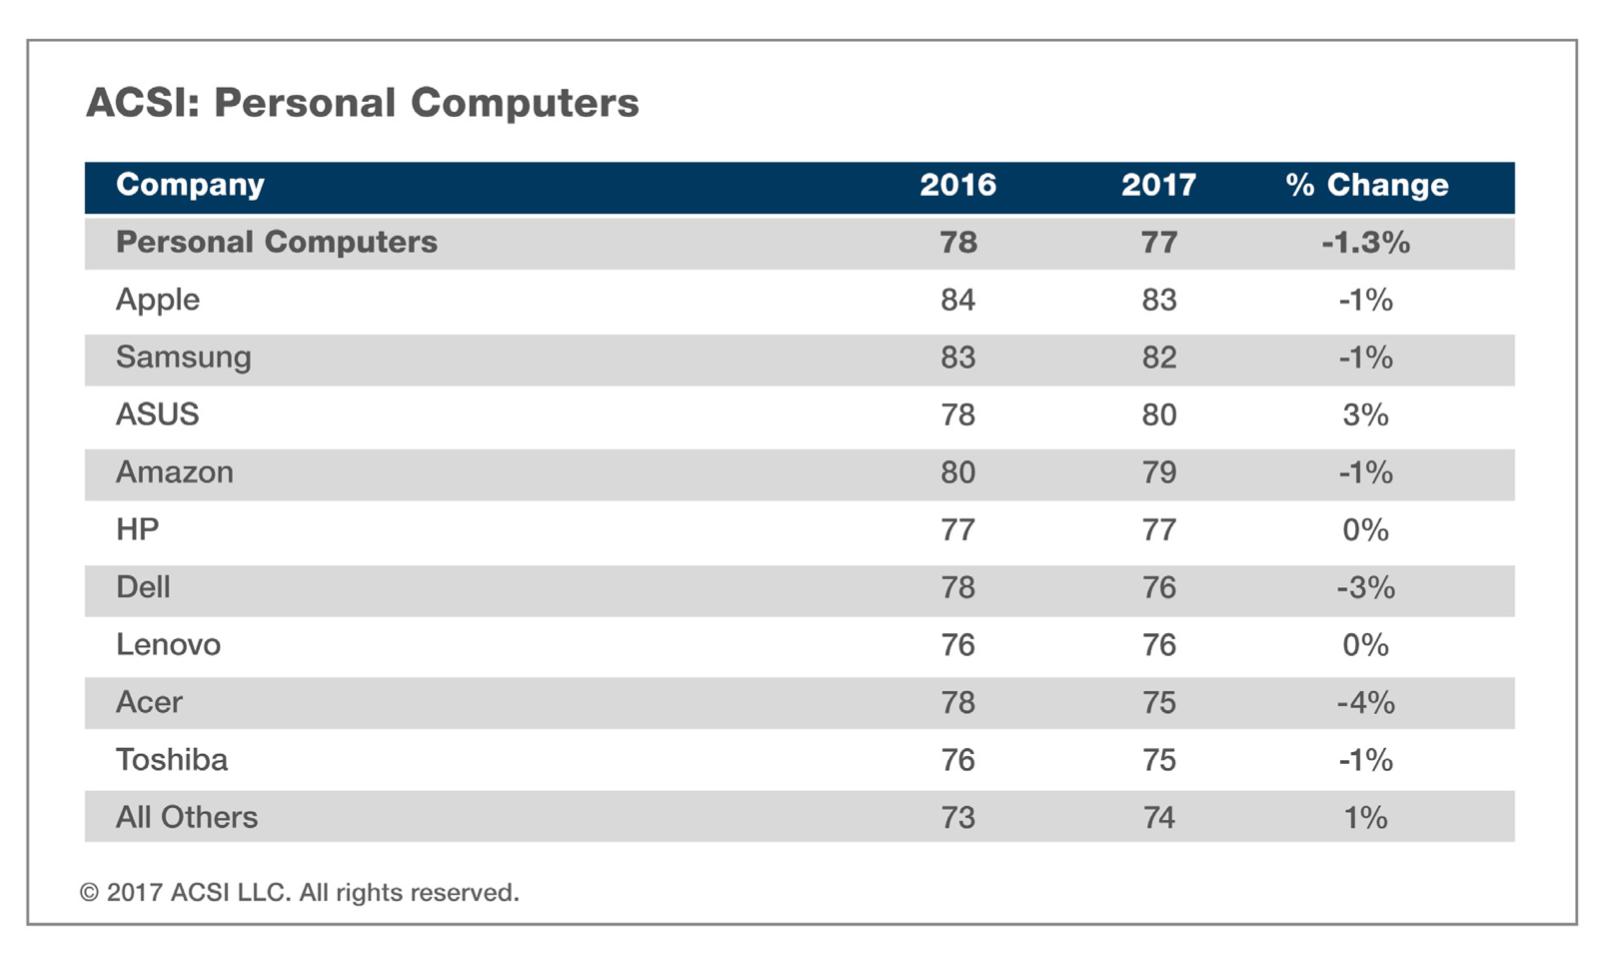 A chart of the ACSI PCs data.